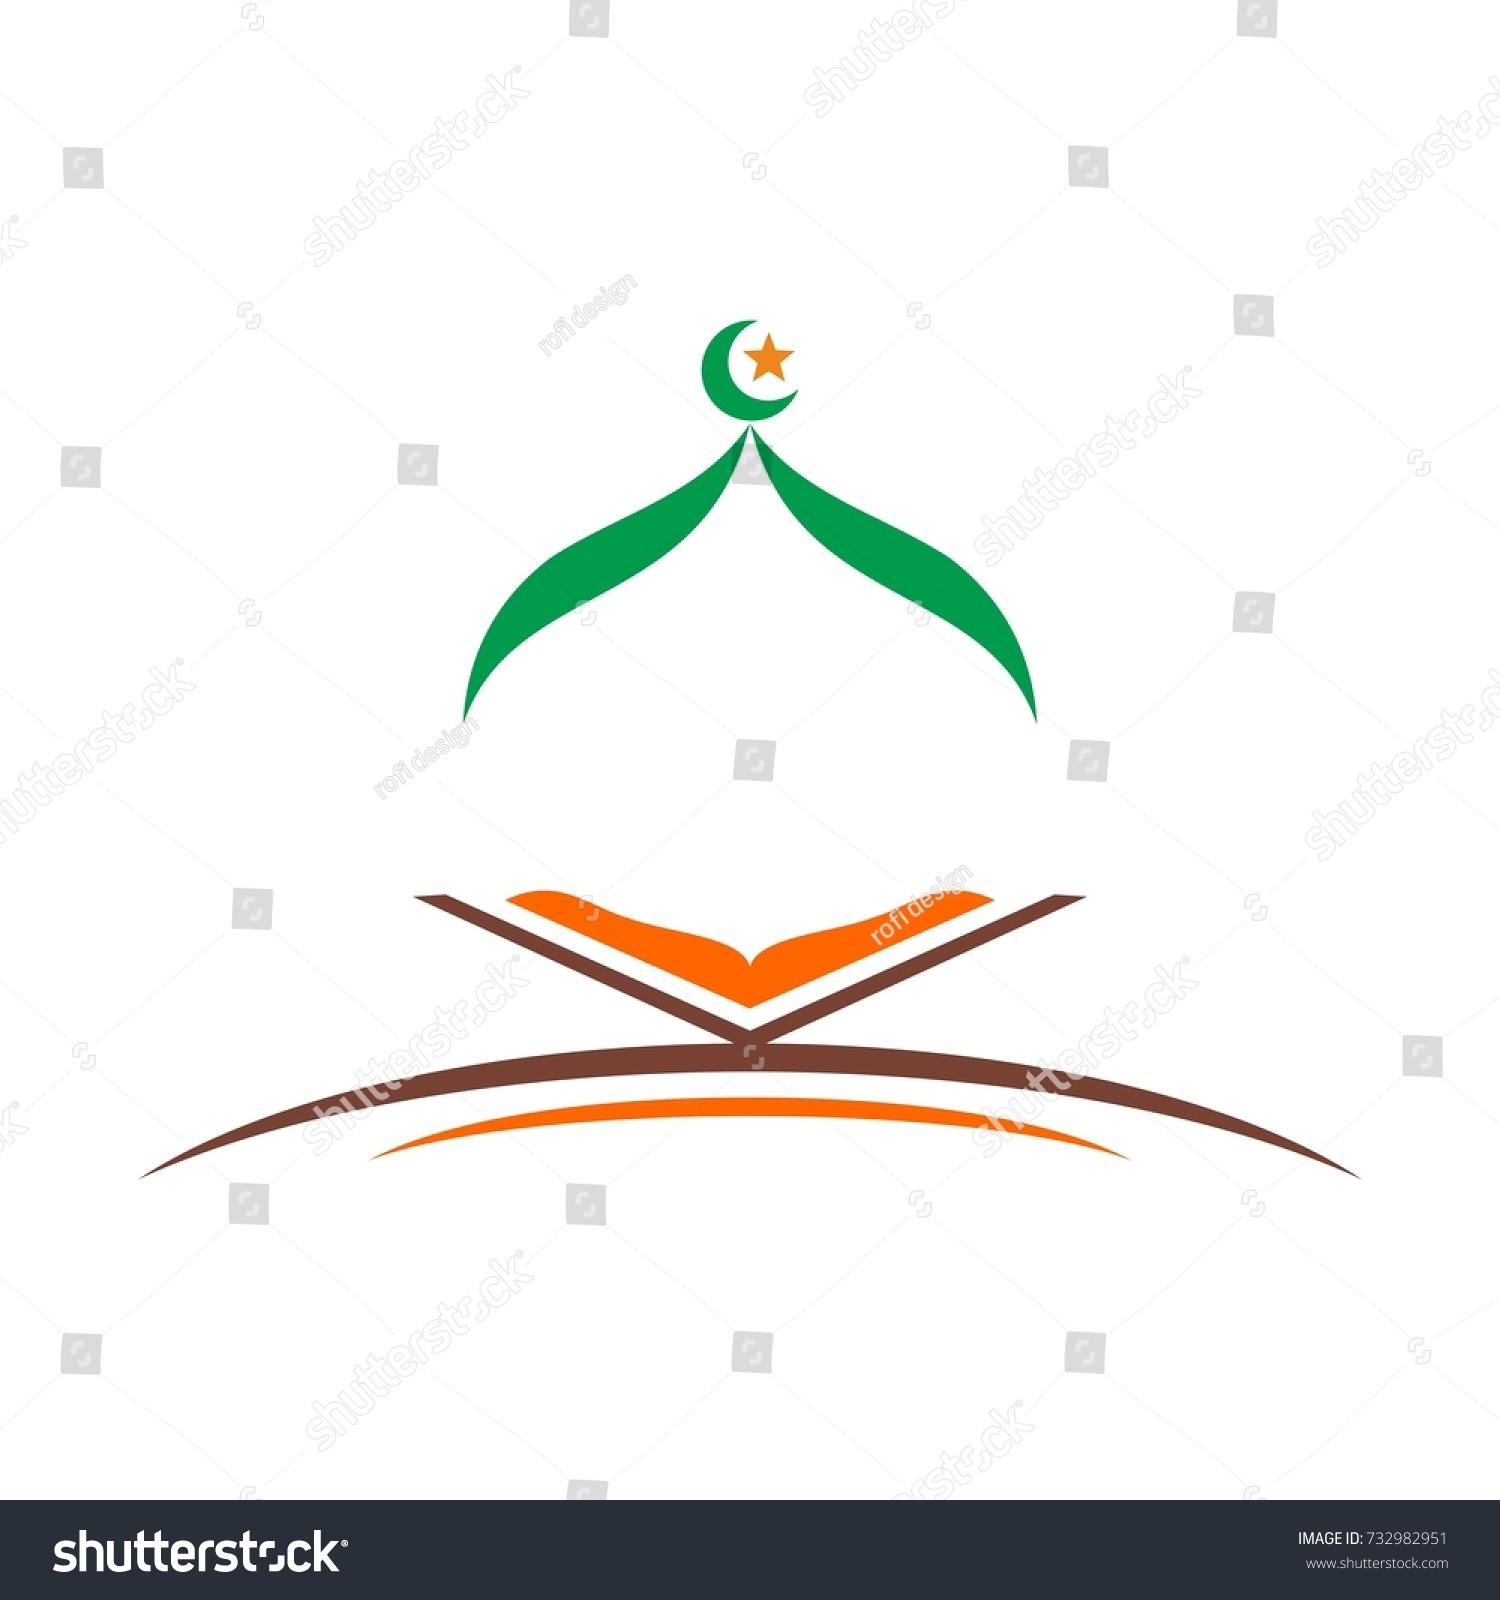 islamic logo book symbol stock vector 2018 732982951 shutterstock rh shutterstock com islamic logo images islamic logo creator